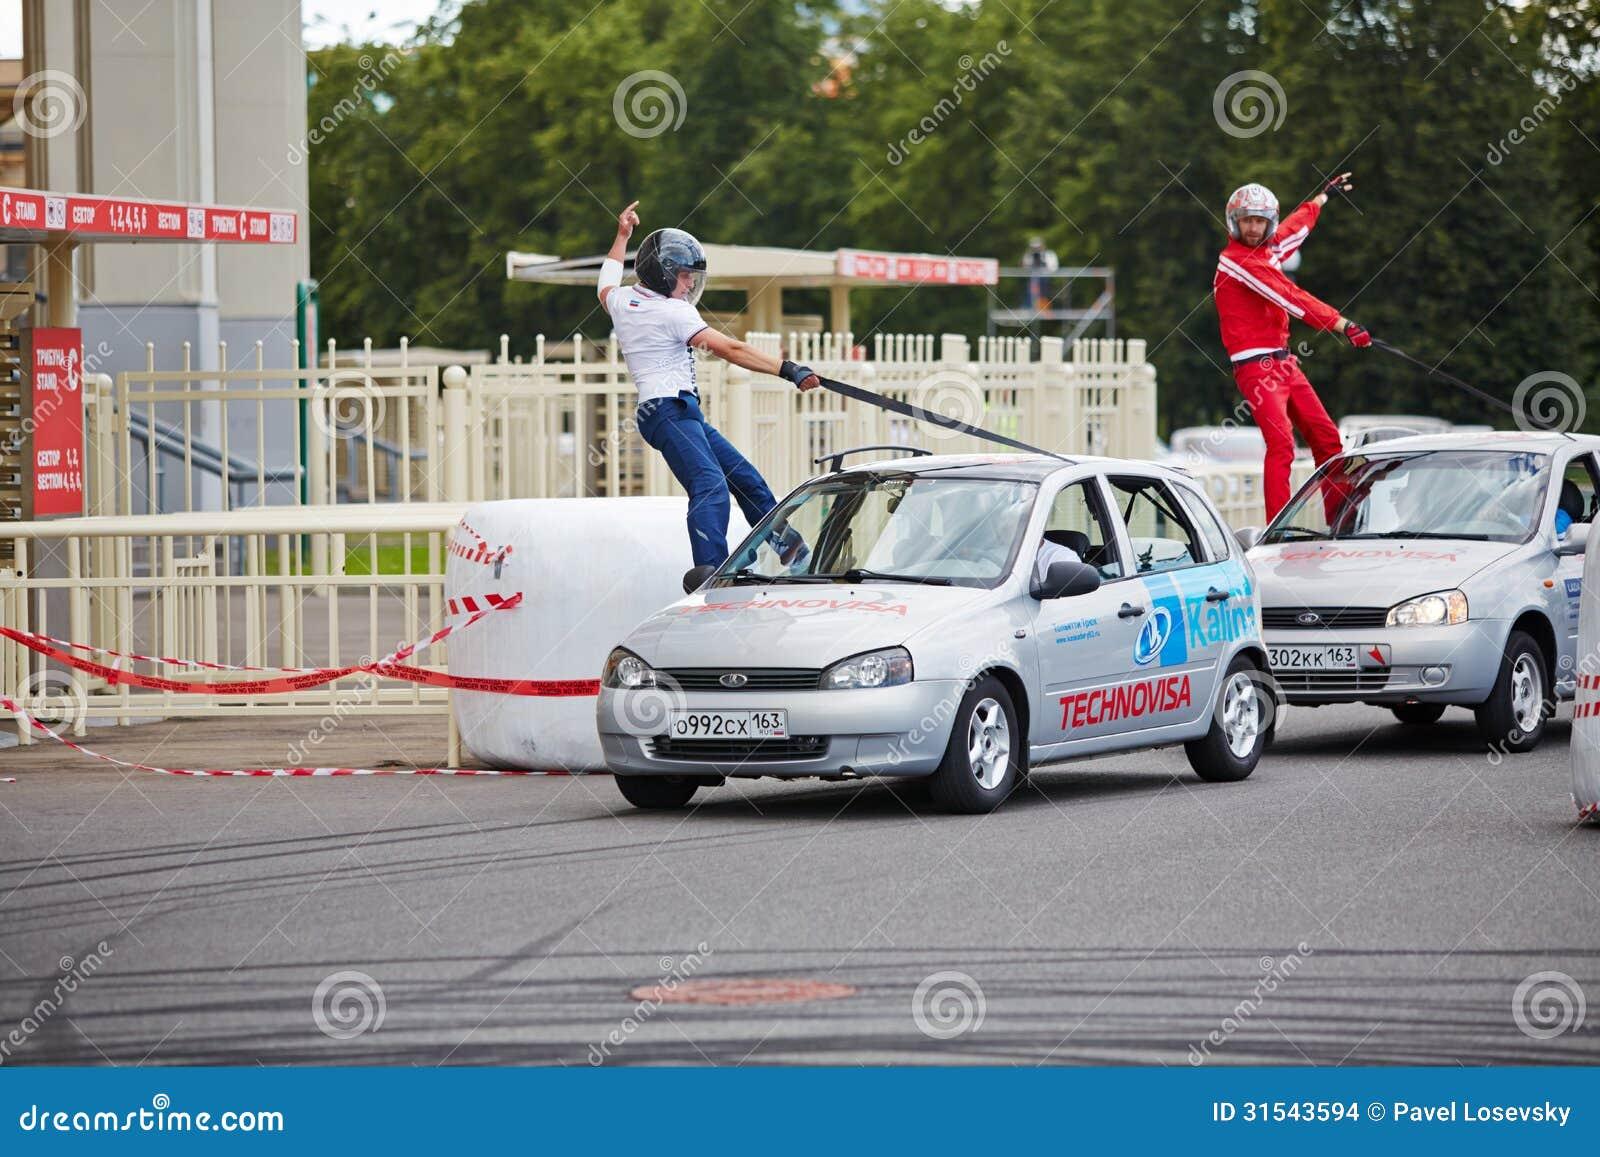 Demonstrative performance of members from stuntmen team